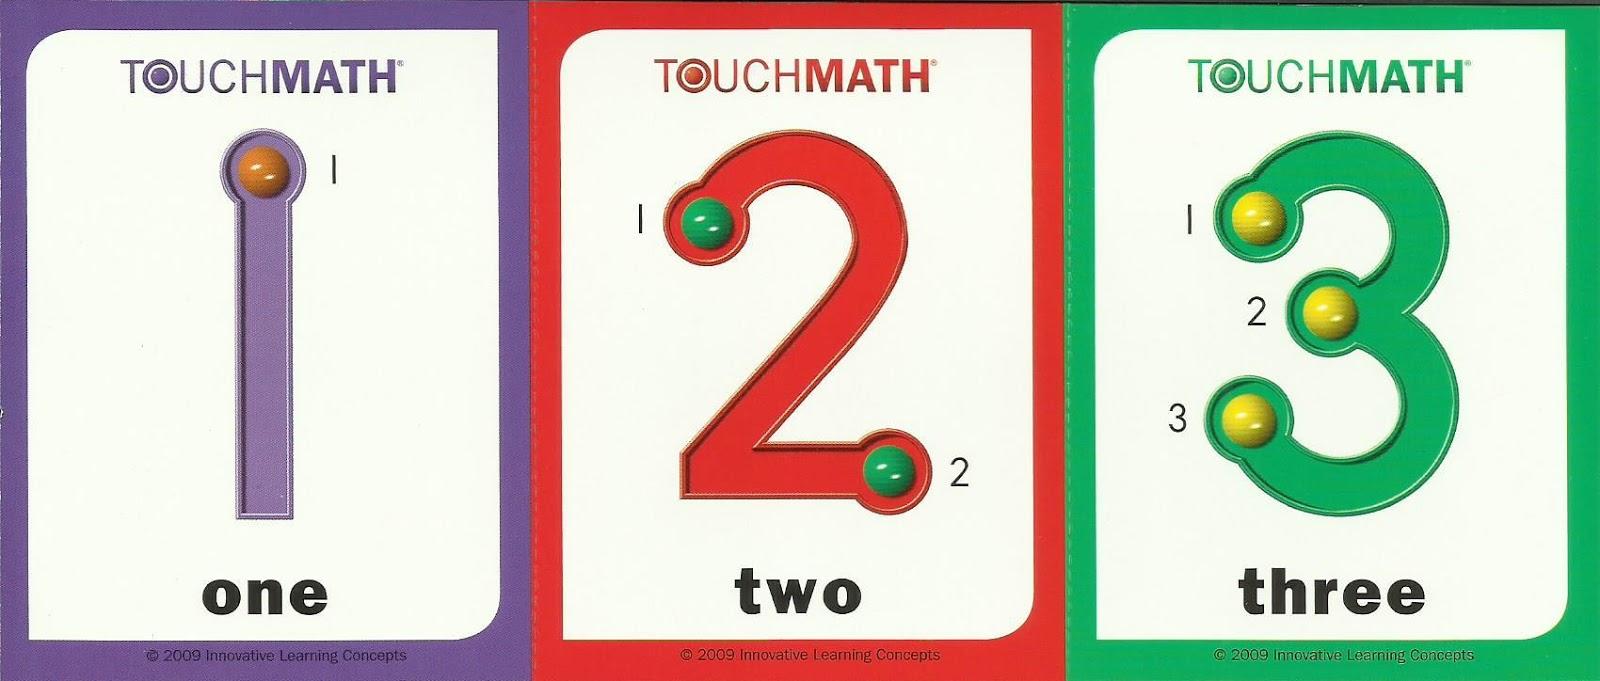 touch math worksheets printable. Black Bedroom Furniture Sets. Home Design Ideas